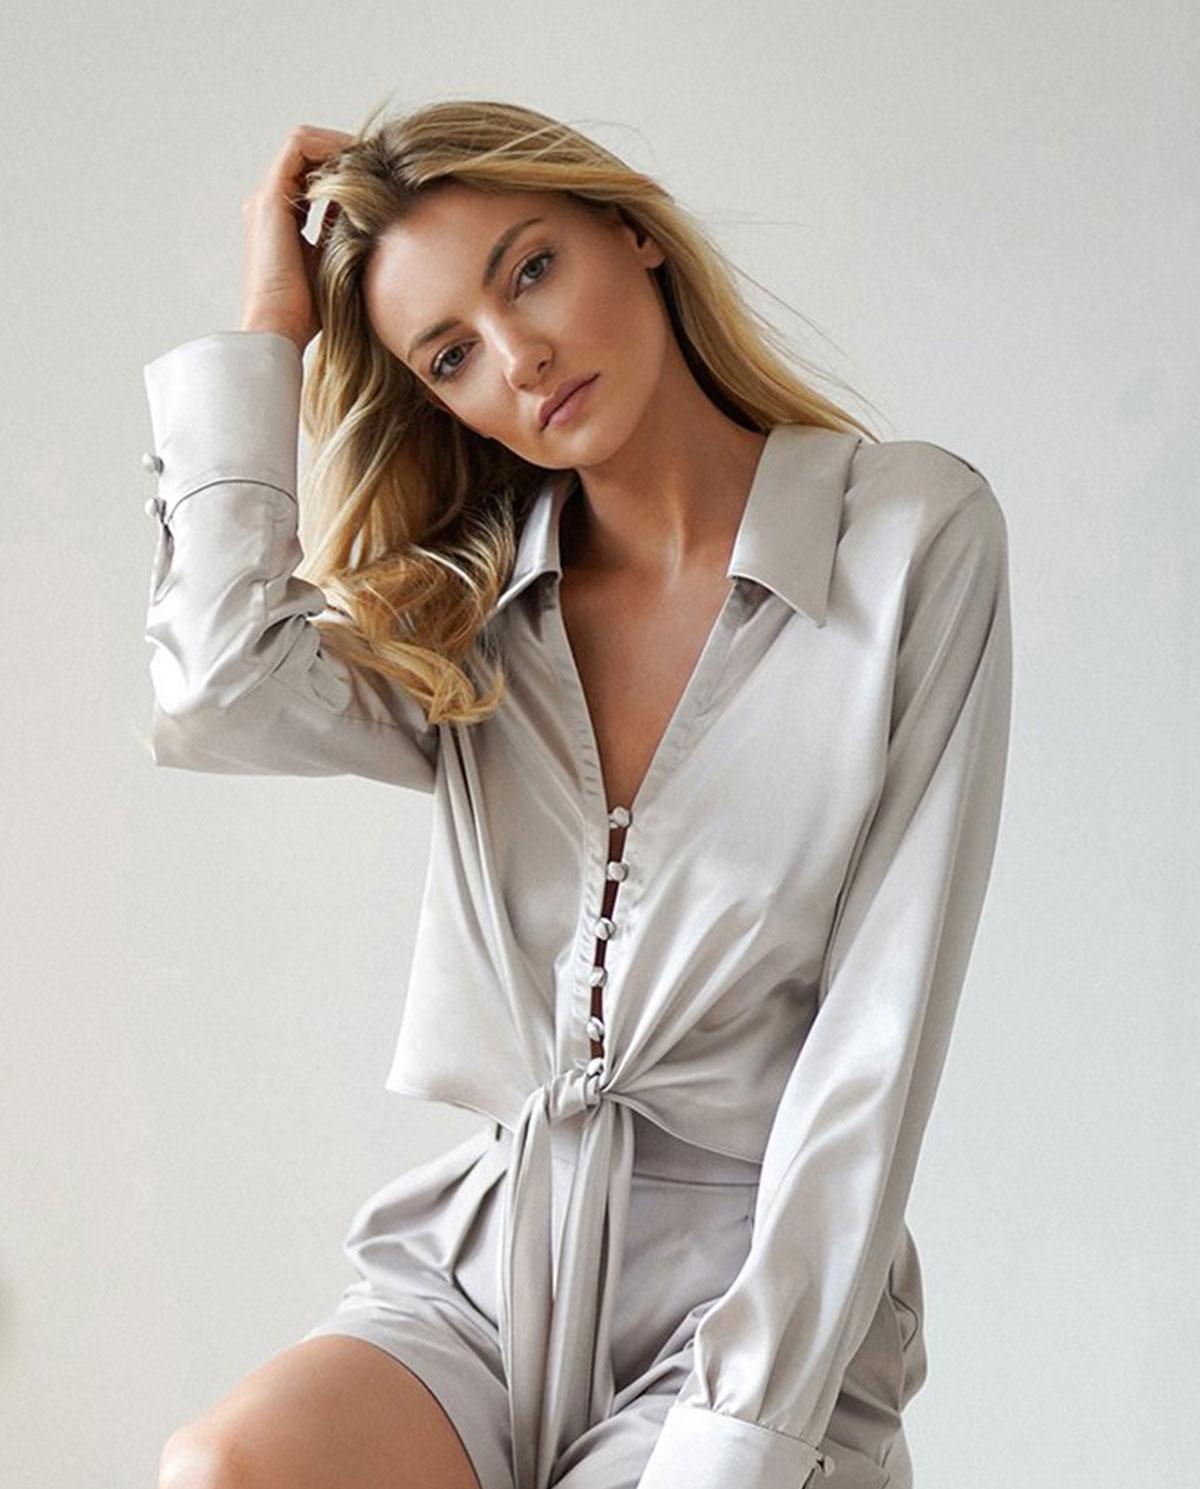 srebrna koszula AMIRA marki Dollina AMI/SAT/SILVER SILVER GRAY